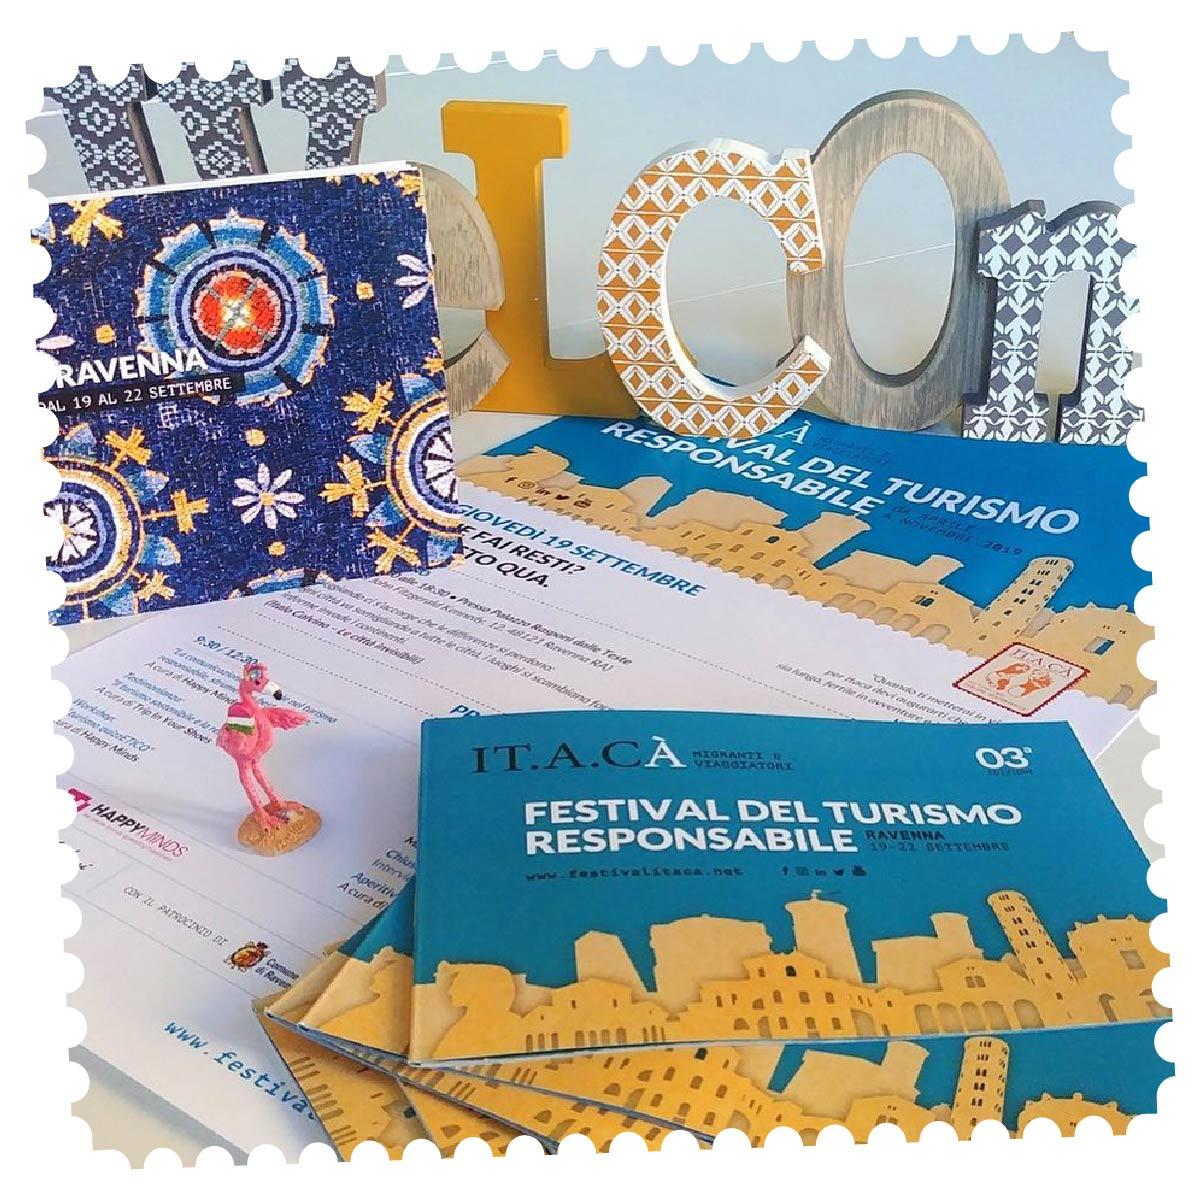 festival-itaca-strategia-eventi-turismo-sostenibile-sponsor-ravenna-3